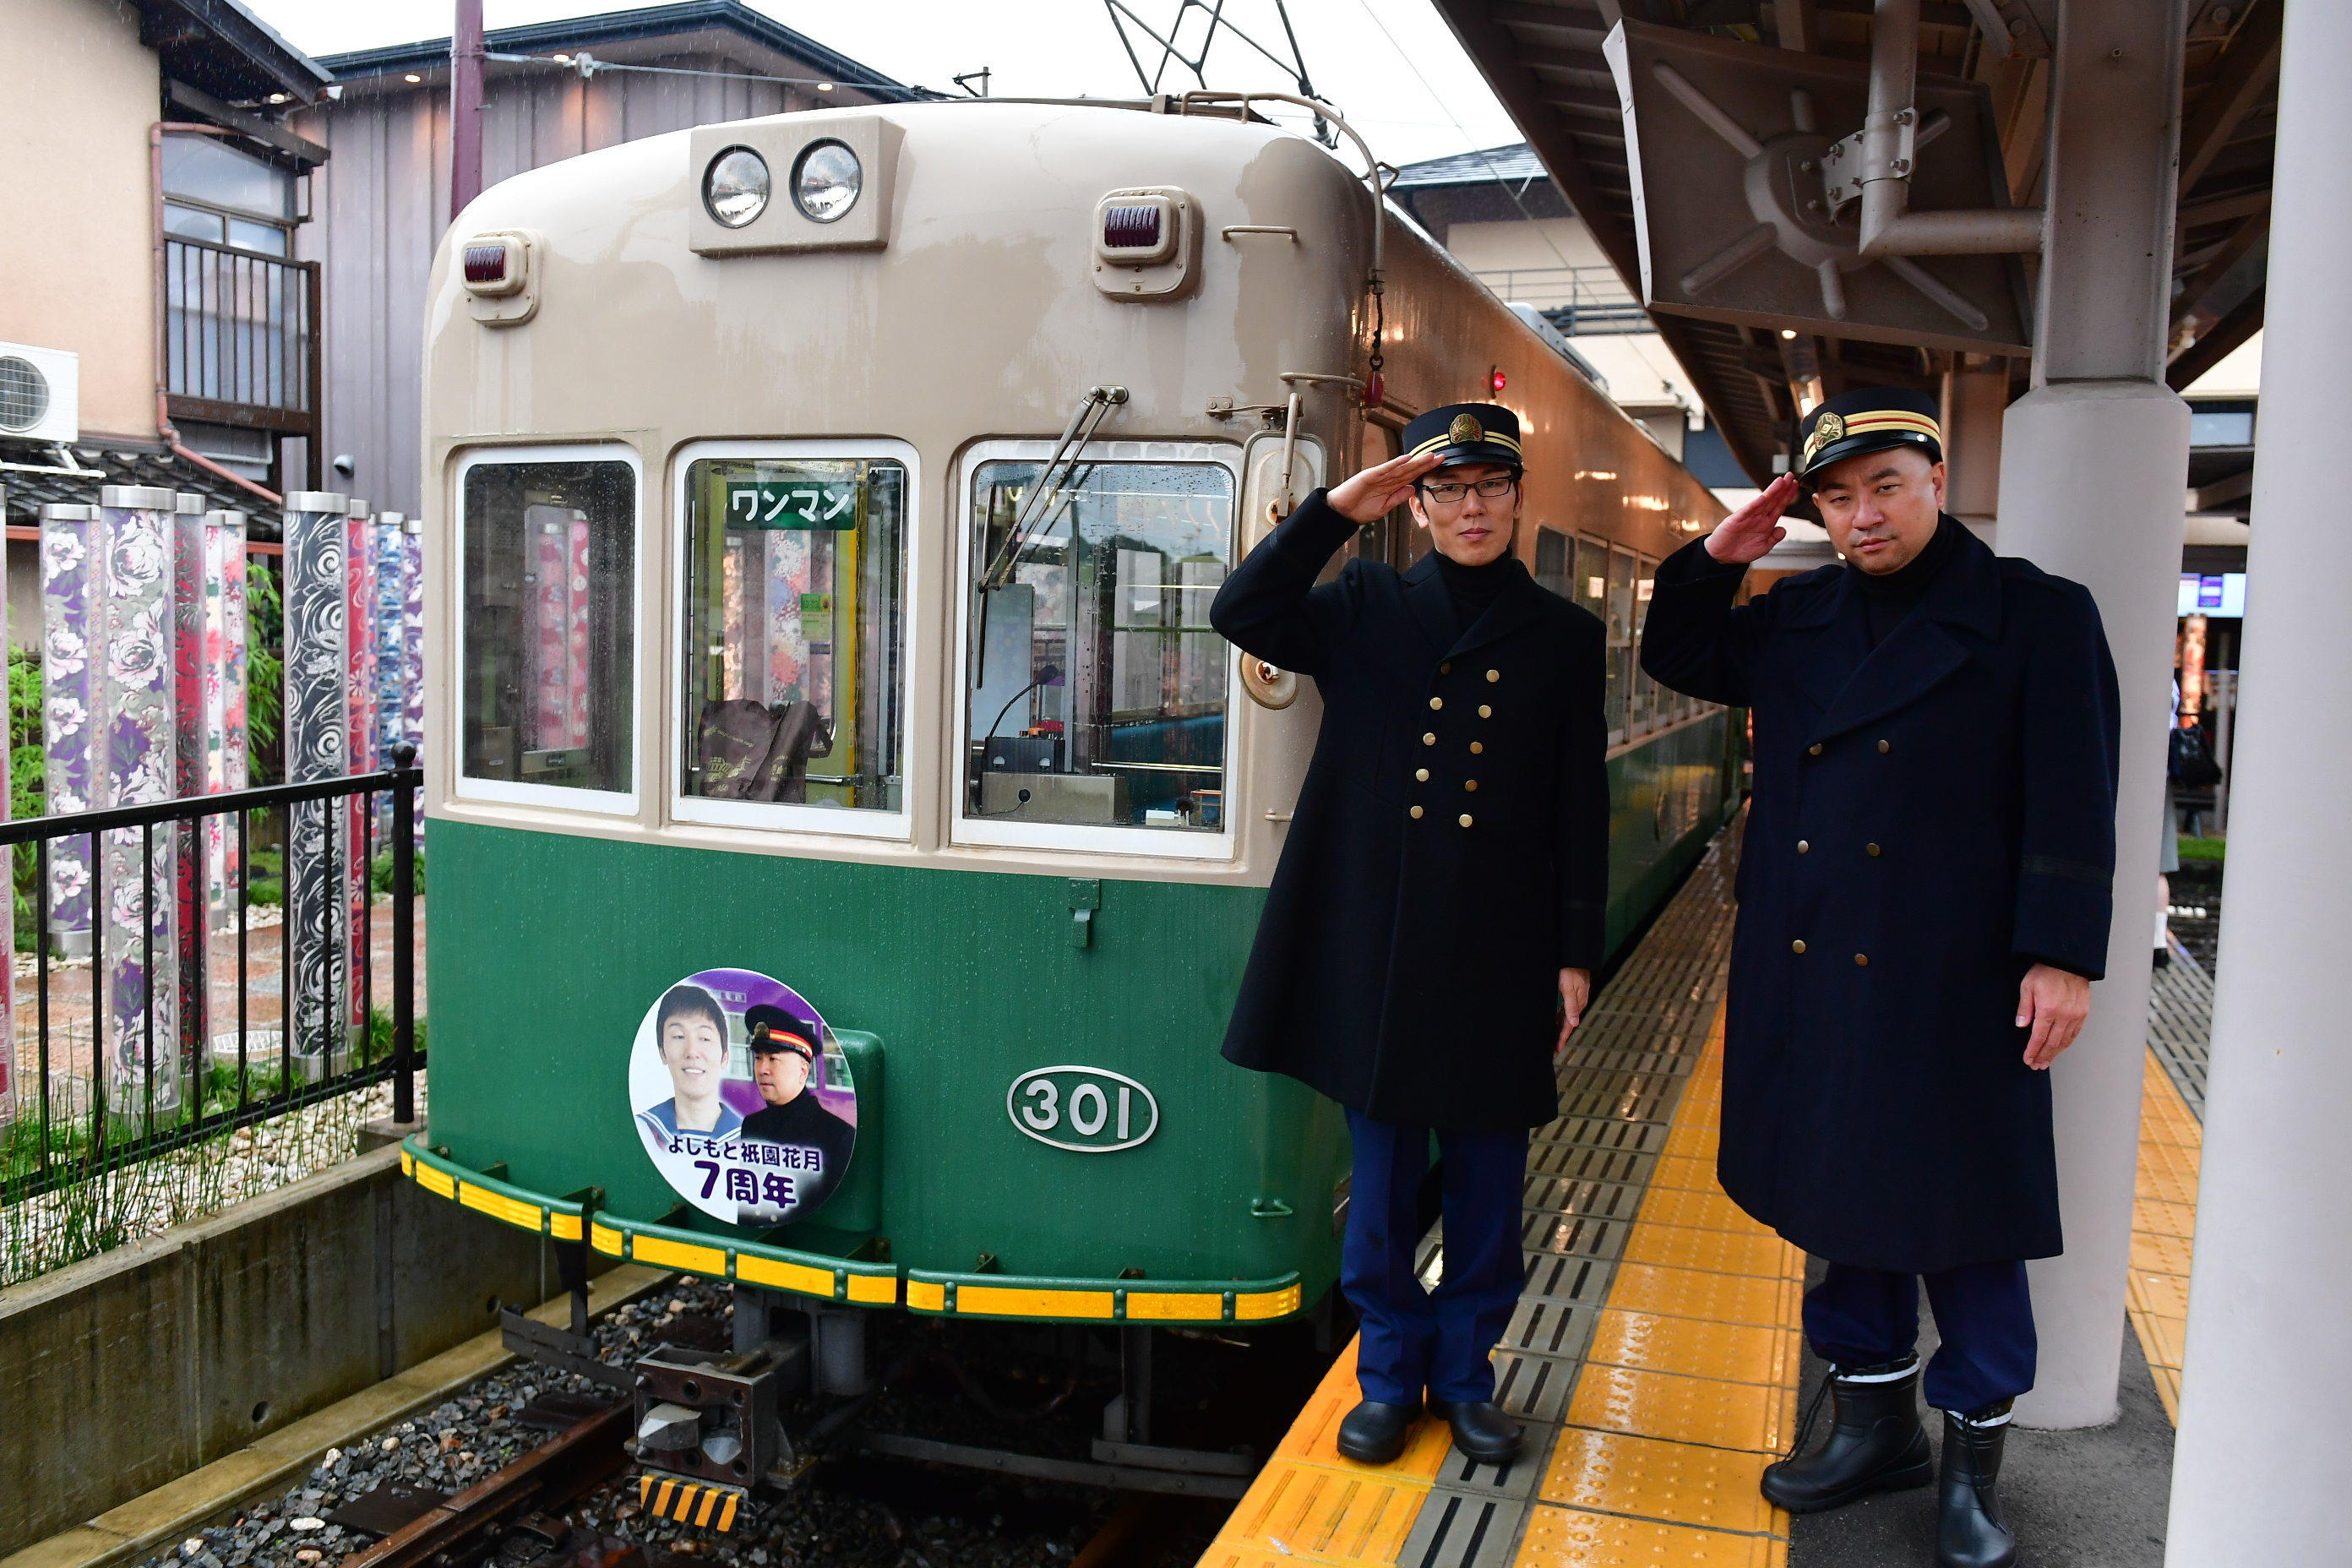 http://news.yoshimoto.co.jp/20180706213945-ada8f7ea8722cee25a7346e7f0bc00eb3ab4593d.jpg